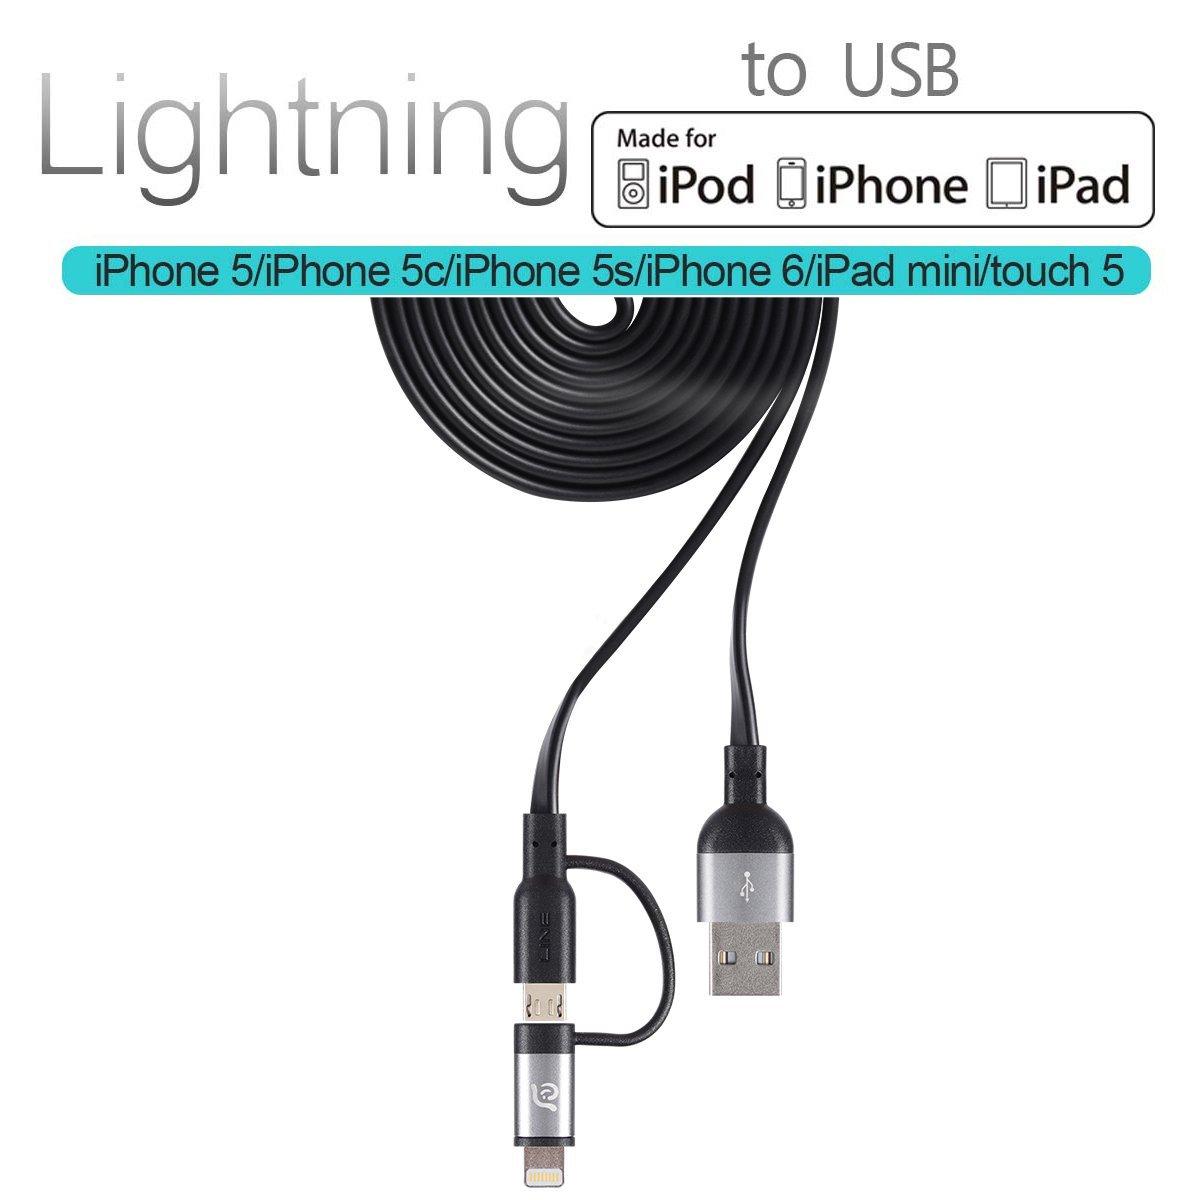 Adam PeAk Lightning Cable, [Apple MFi Certified] 120FT Duo Mfi Metal tangle free flat Lightning reversible USB cable for iPhone 6, iPhone 6 Plus, 5s 5c 5, iPad Air Air2 mini mini2 mini3, iPad 4th gen, iPod touch 5th gen, and iPod nano 7th Grey